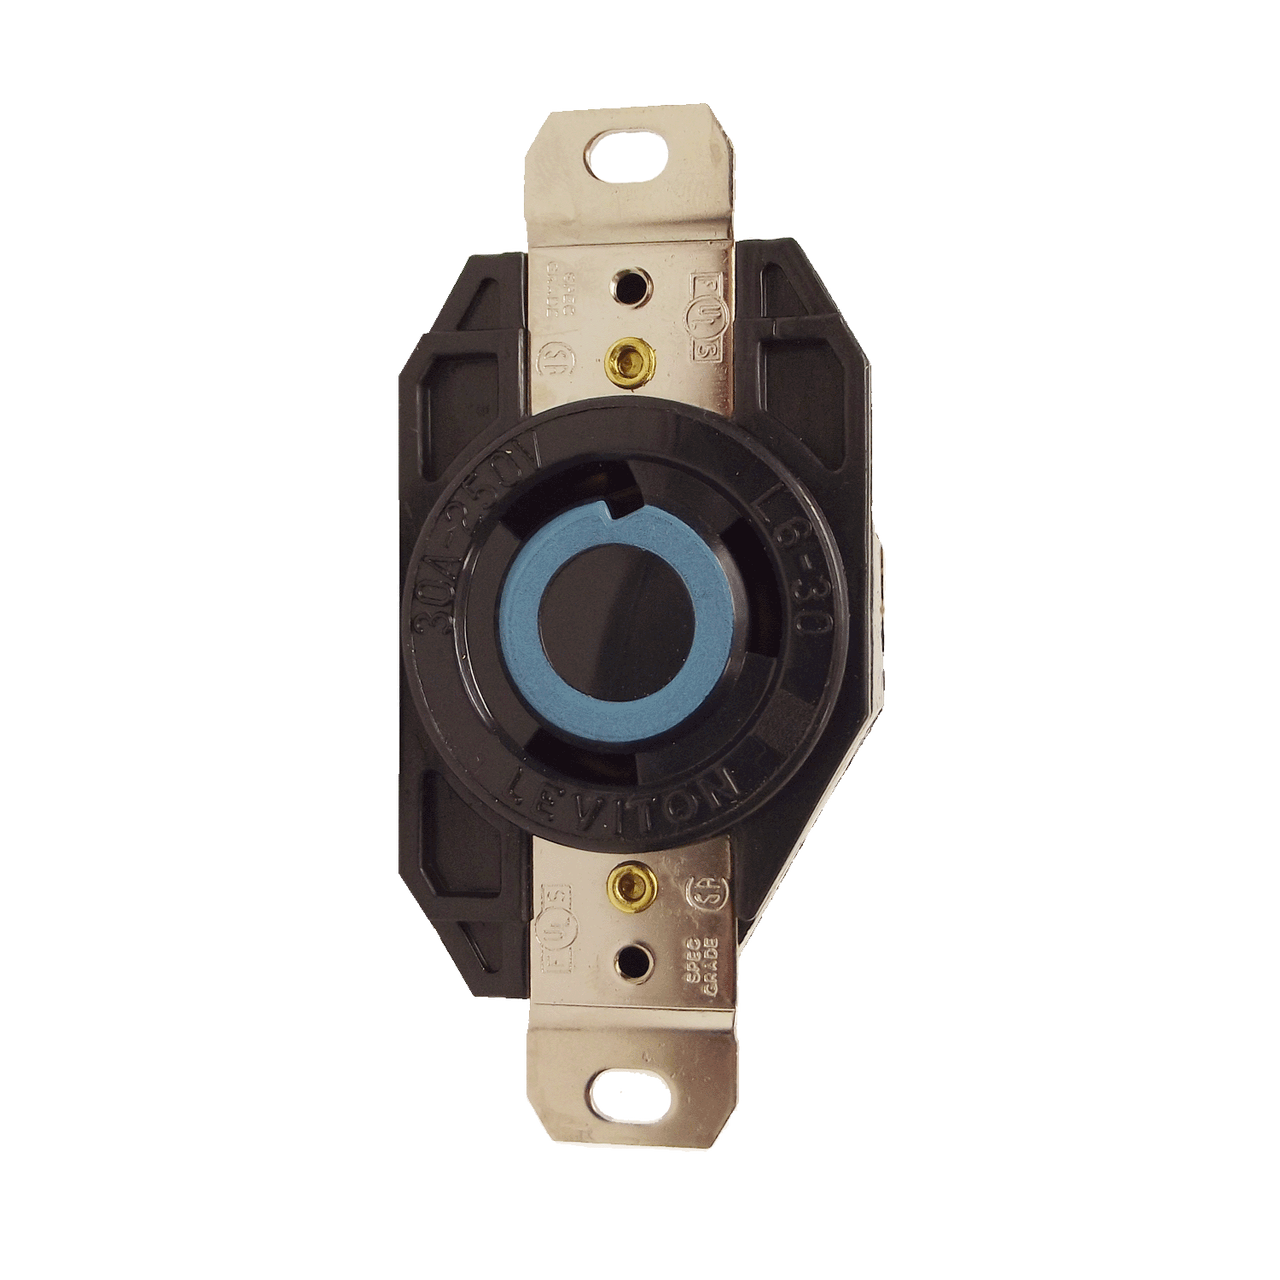 Leviton 2750 - 30 Amp 125/208 Volt 3 Phase/Y 4 Pole Flush ...